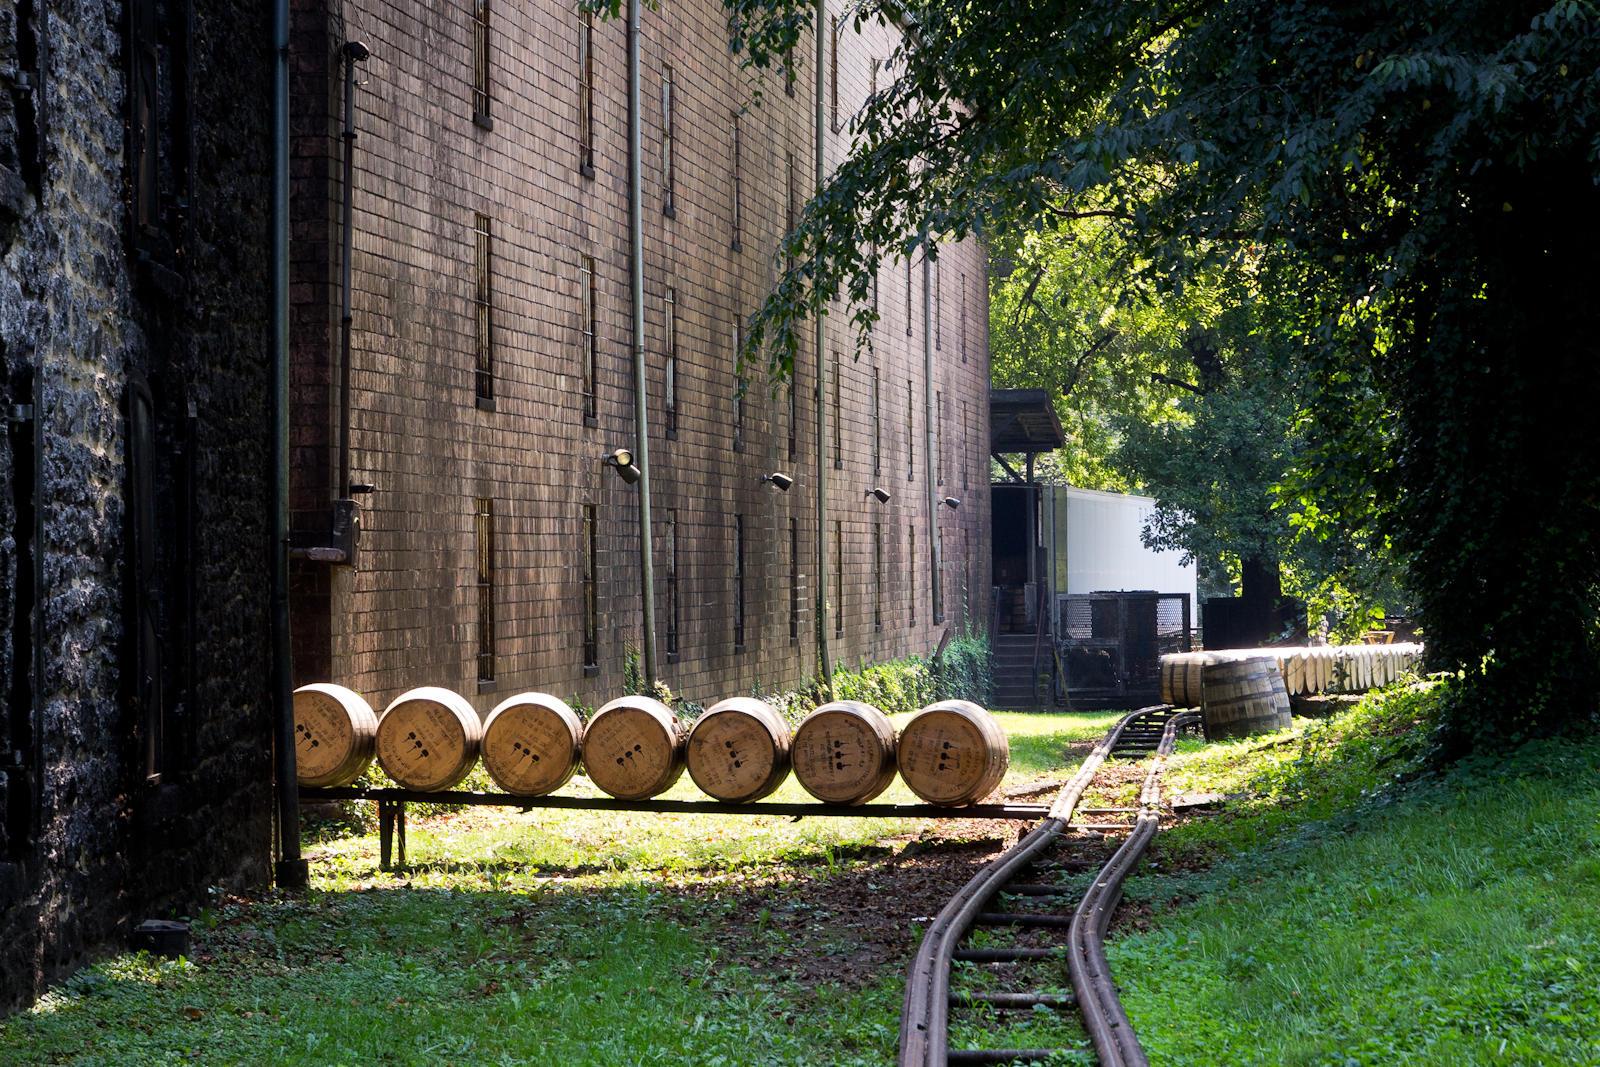 Woodford Reserve Distillery image 4